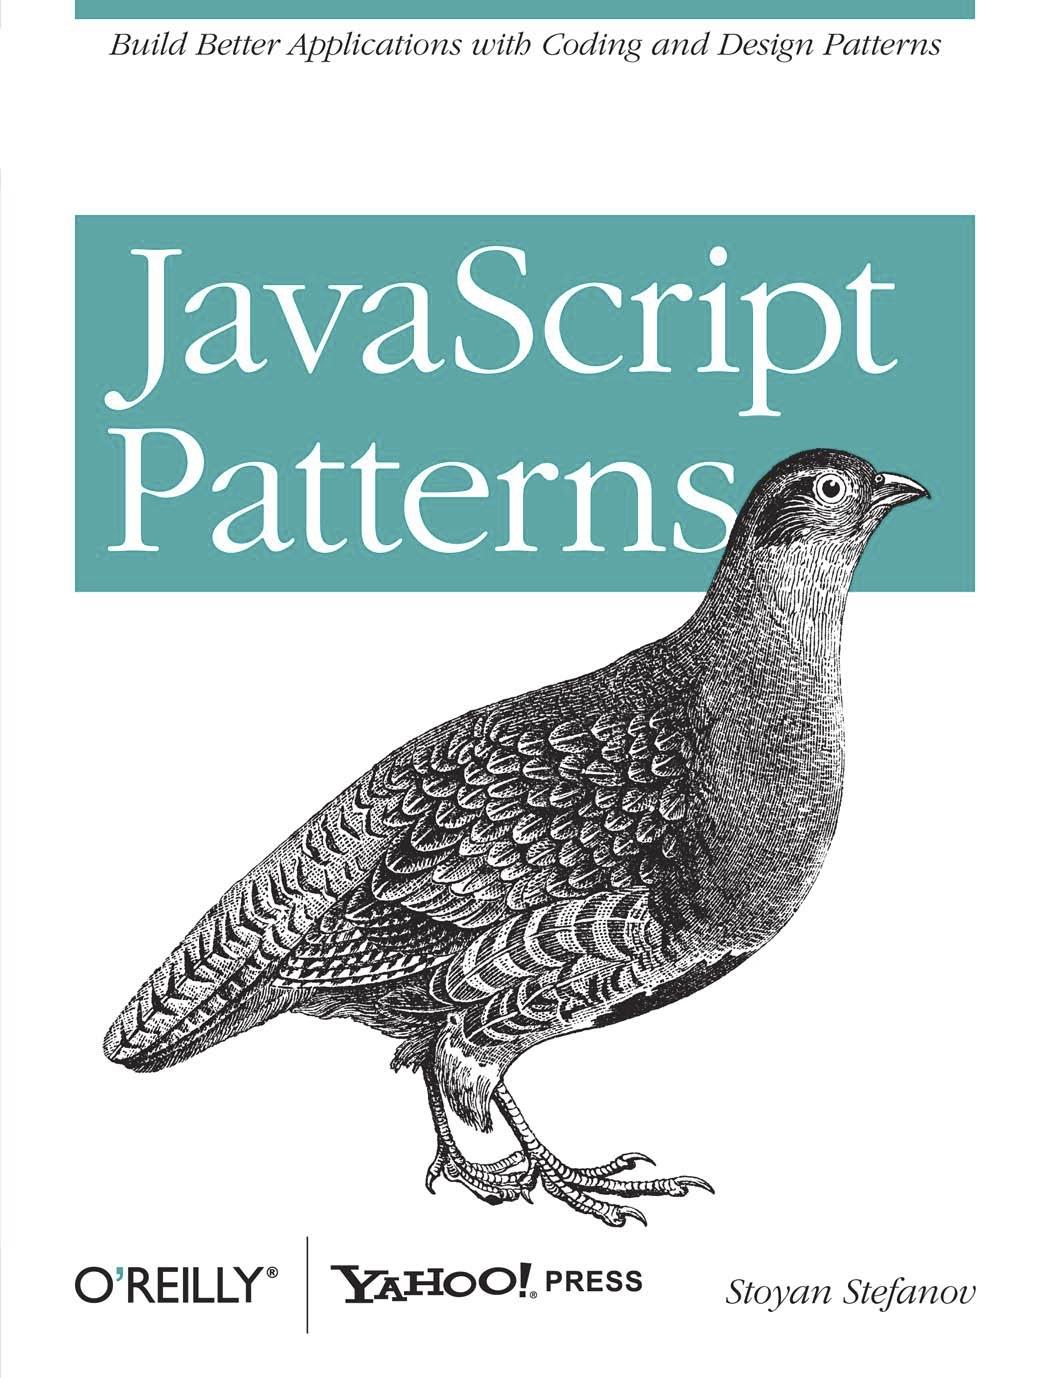 15 Awesome And Free JavaScript Books - Tutorialzine